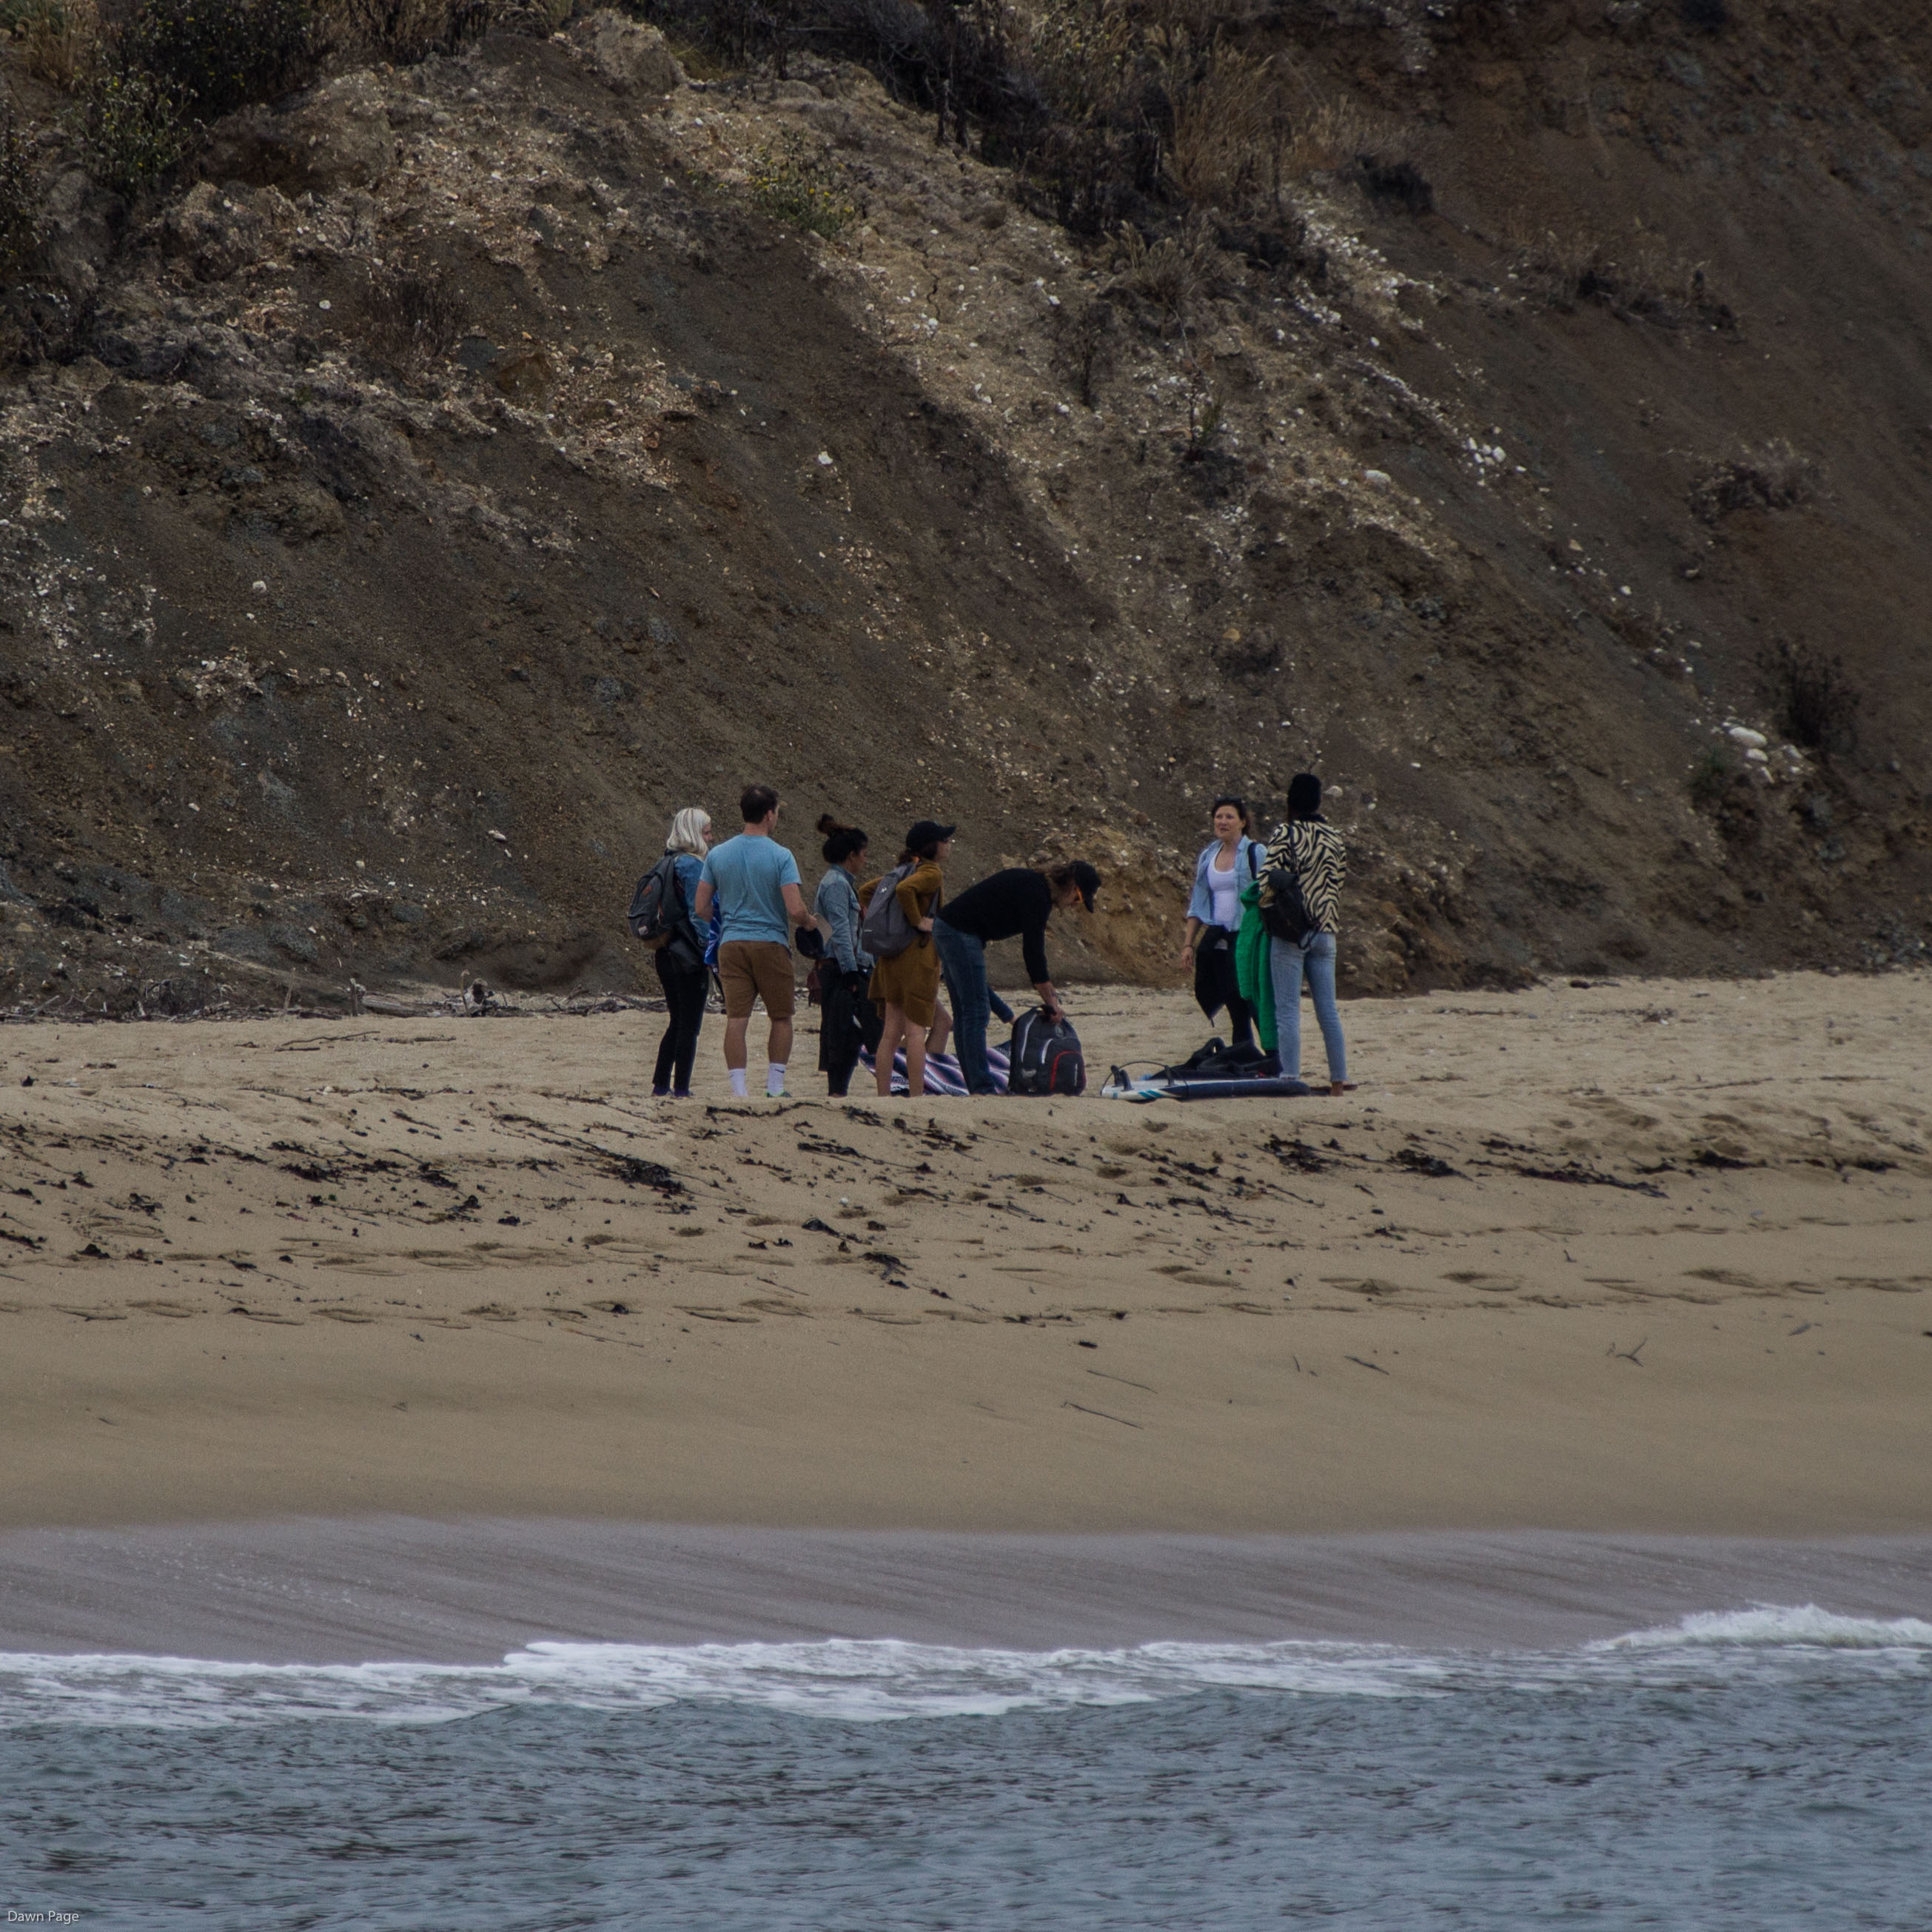 Friends at Martins Beach, near Half Moon Bay, California. Dawn Page / CoastsideSlacking